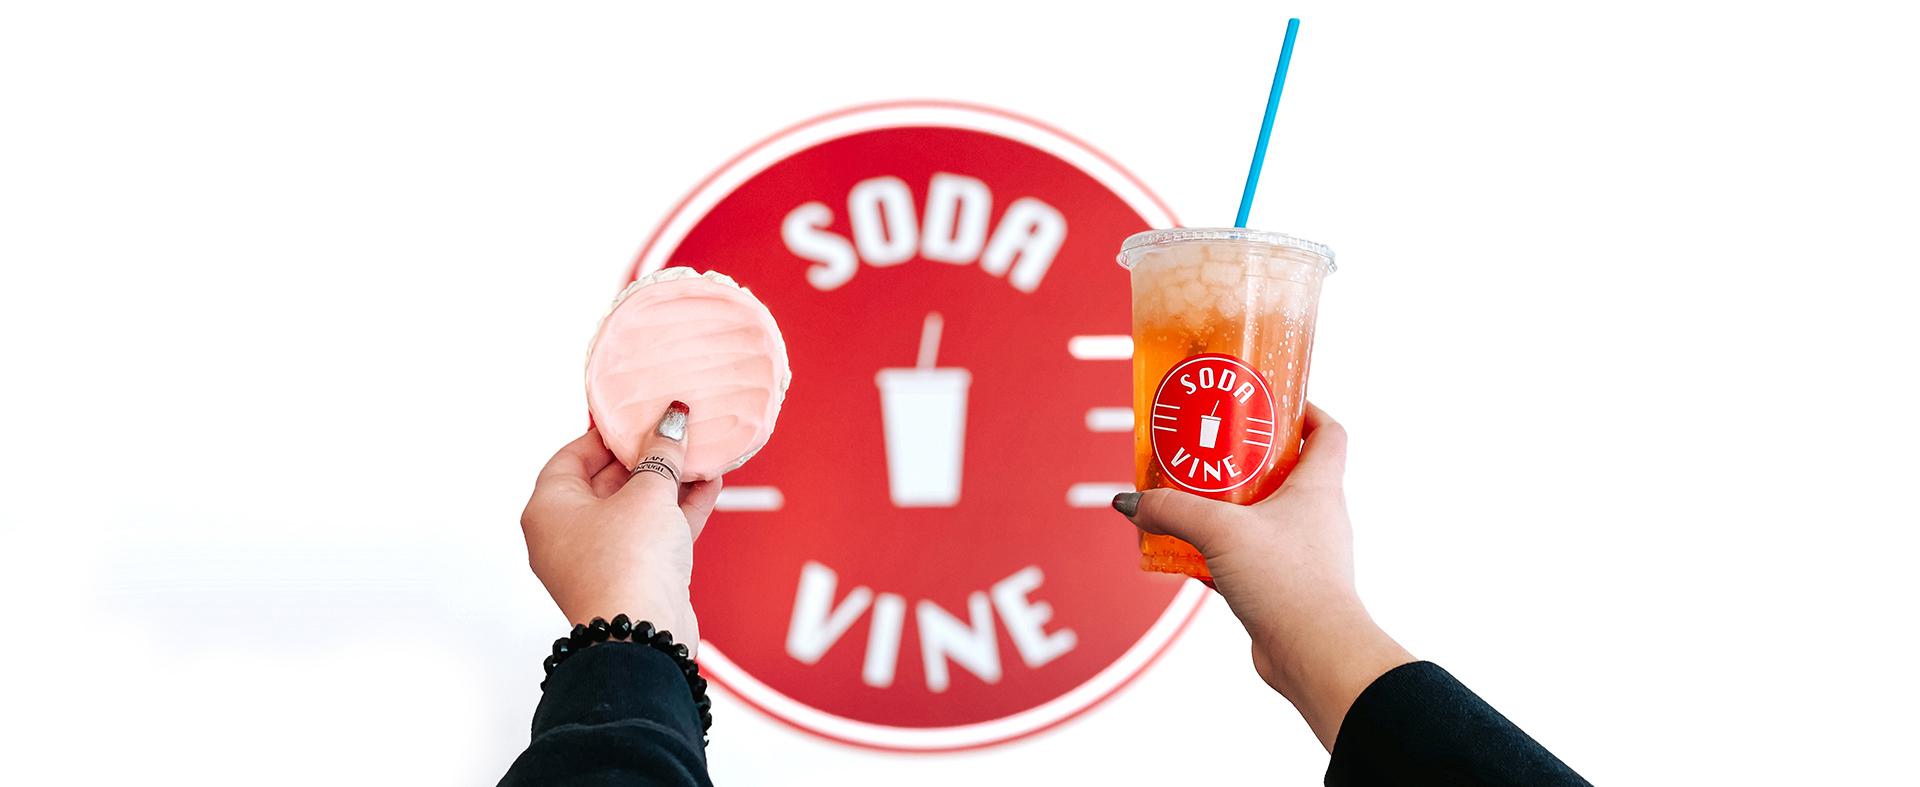 Soda-Vine-soda-and-cookies-idaho-1-3